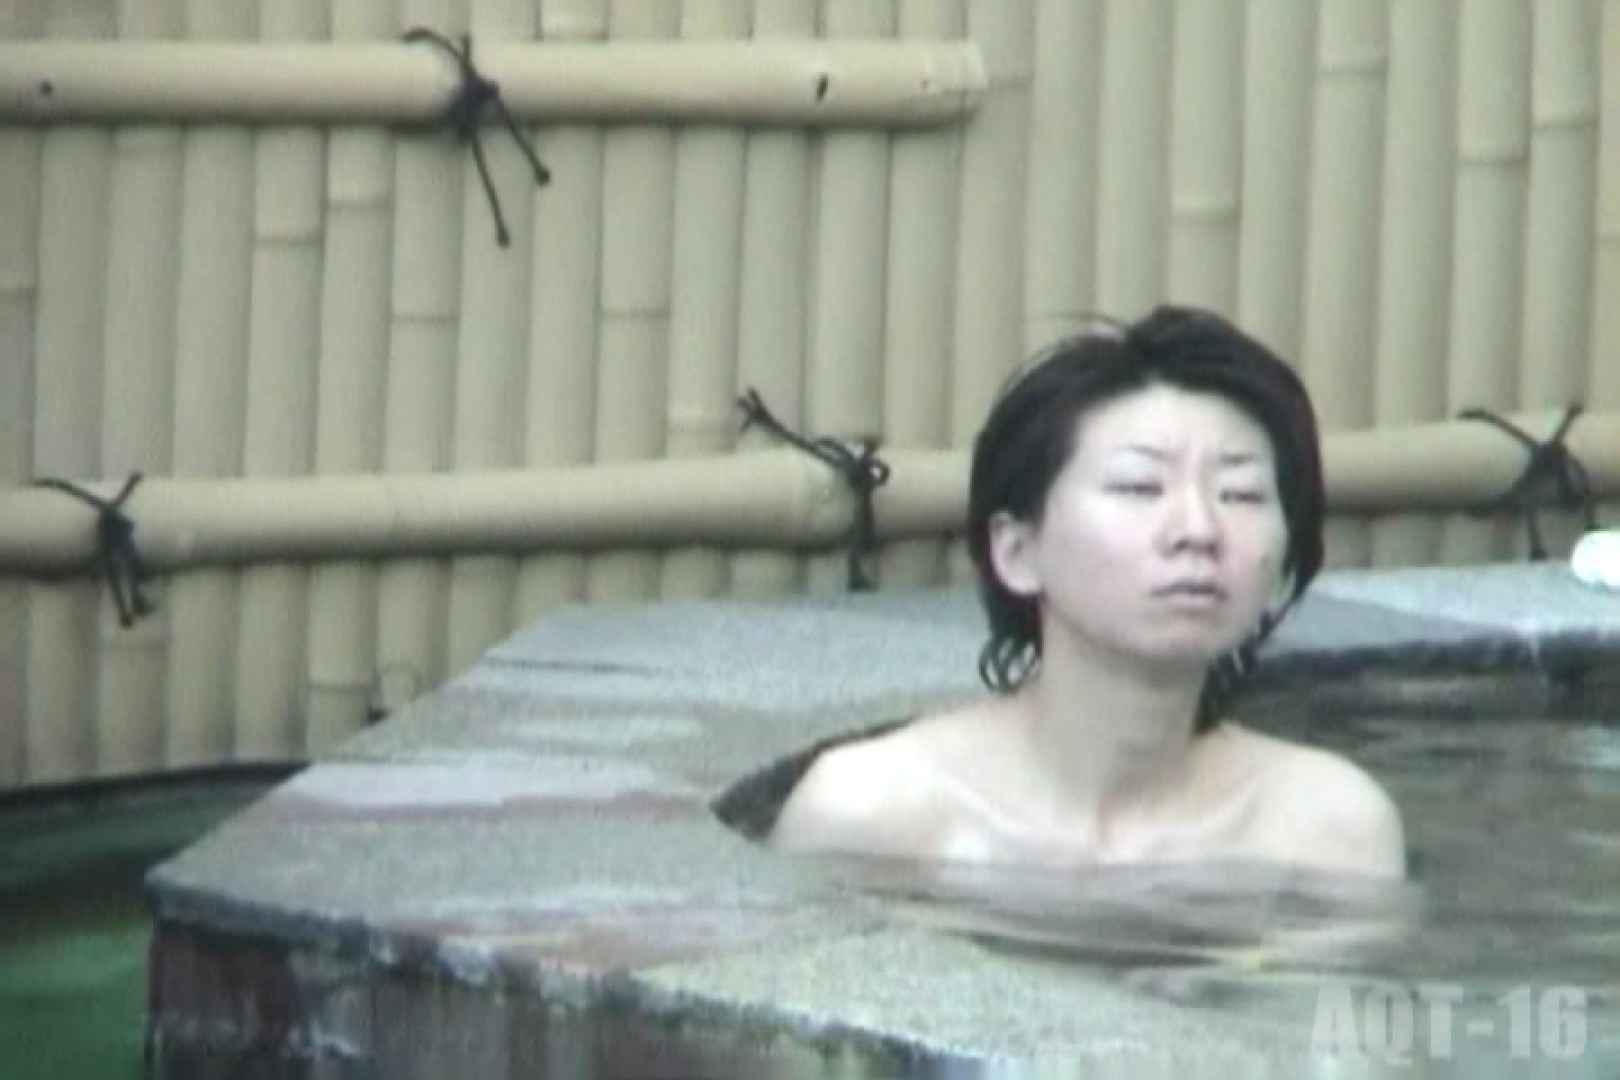 Aquaな露天風呂Vol.842 露天風呂編 | 盗撮シリーズ  82PIX 25